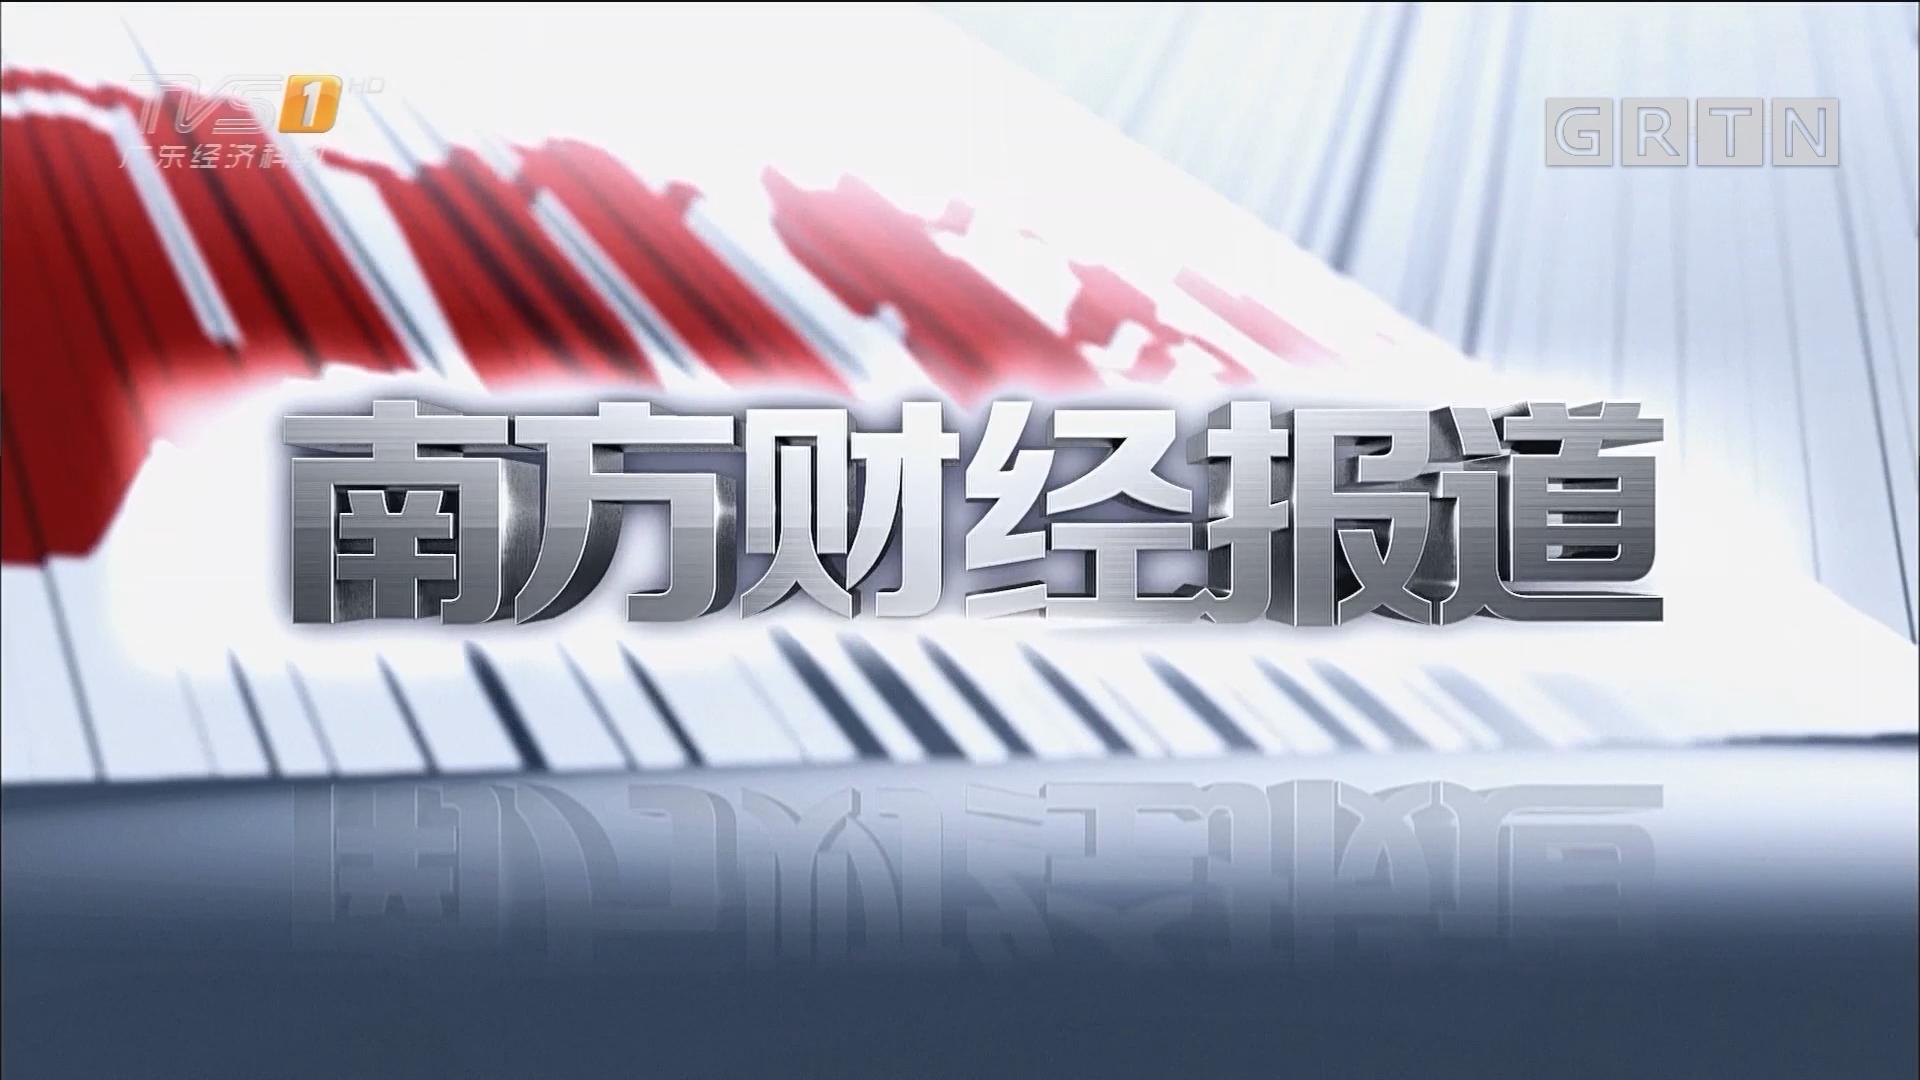 [HD][2018-05-05]南方财经报道:中美经贸磋商就部分问题达成共识 双方同意建立工作机制保持密切沟通